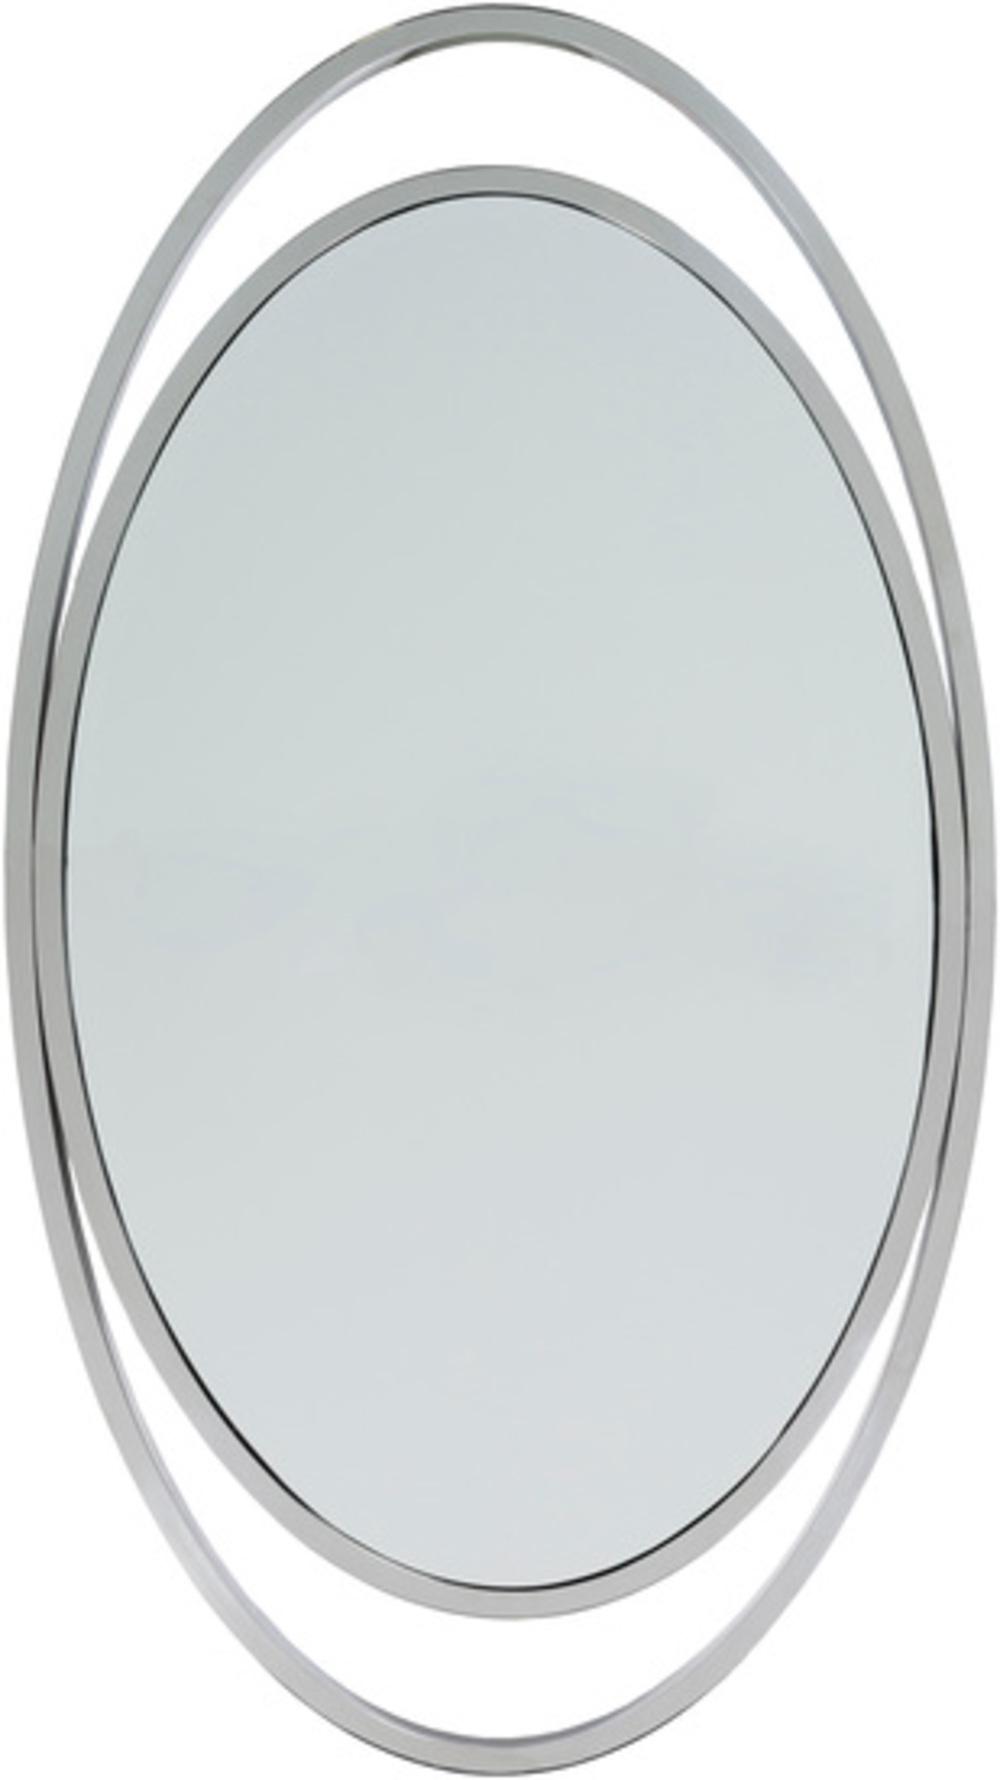 Surya - Hallet Mirror